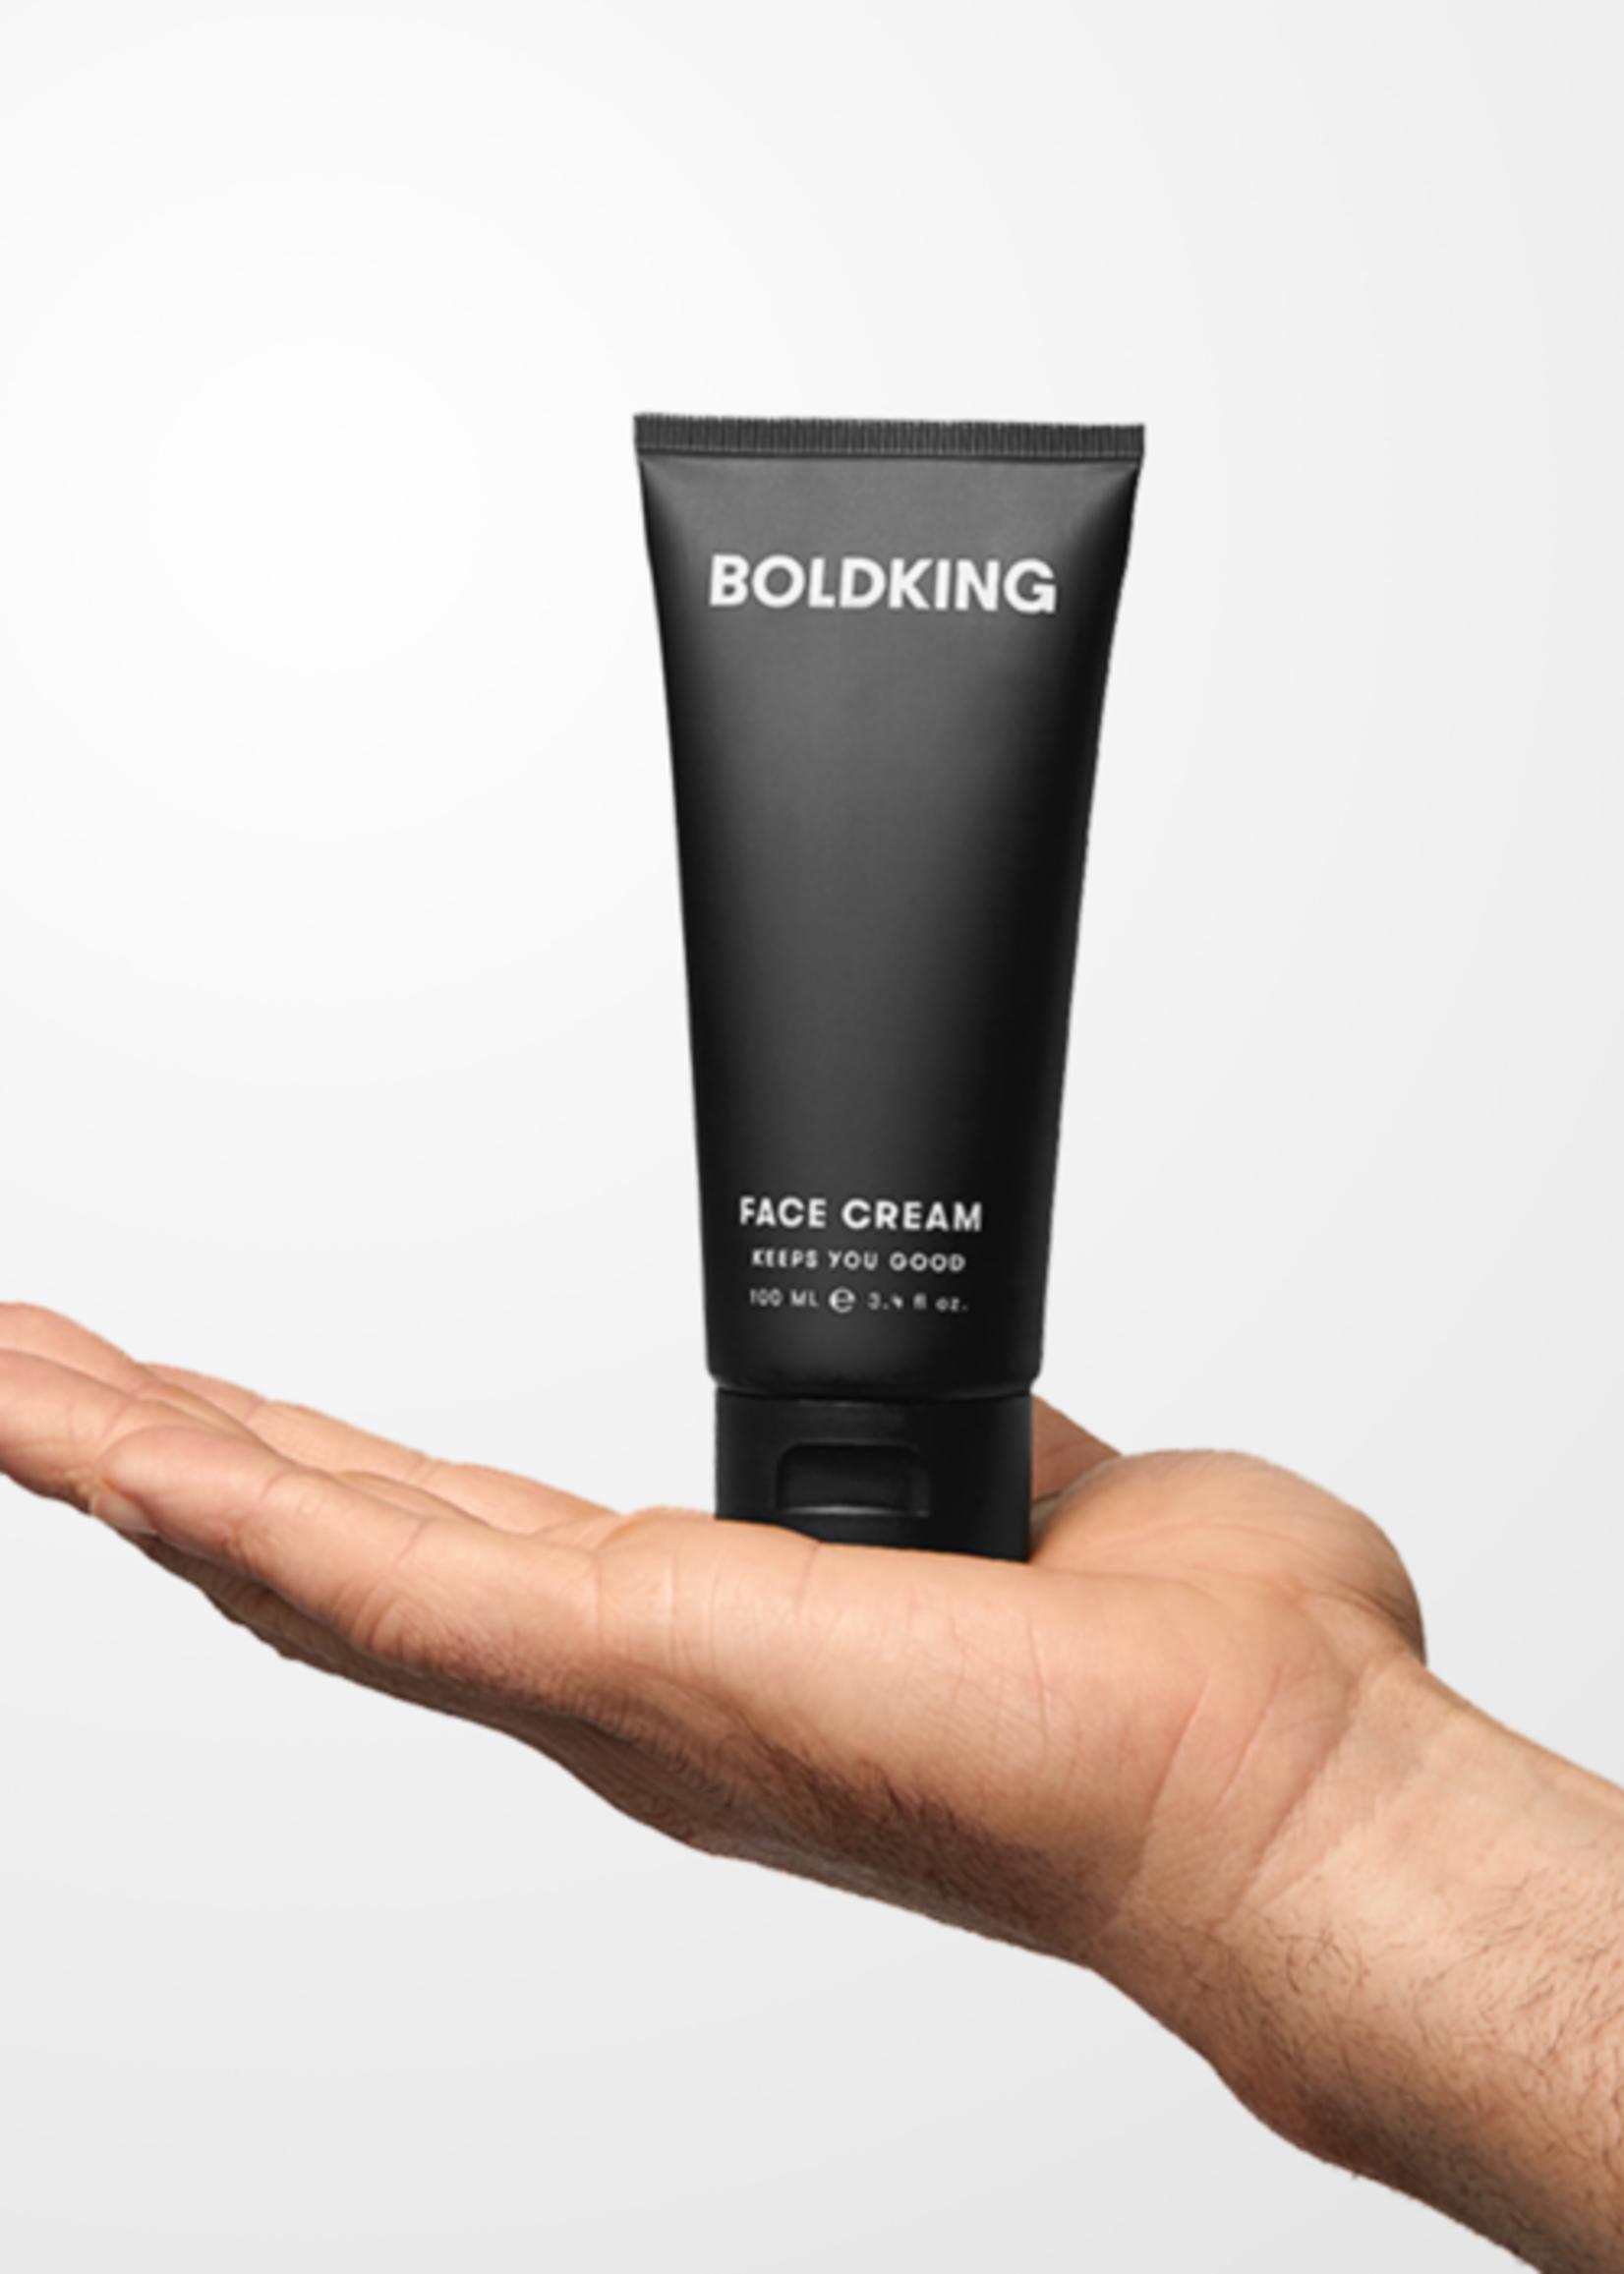 Boldking Boldking - Face Cream -100ML